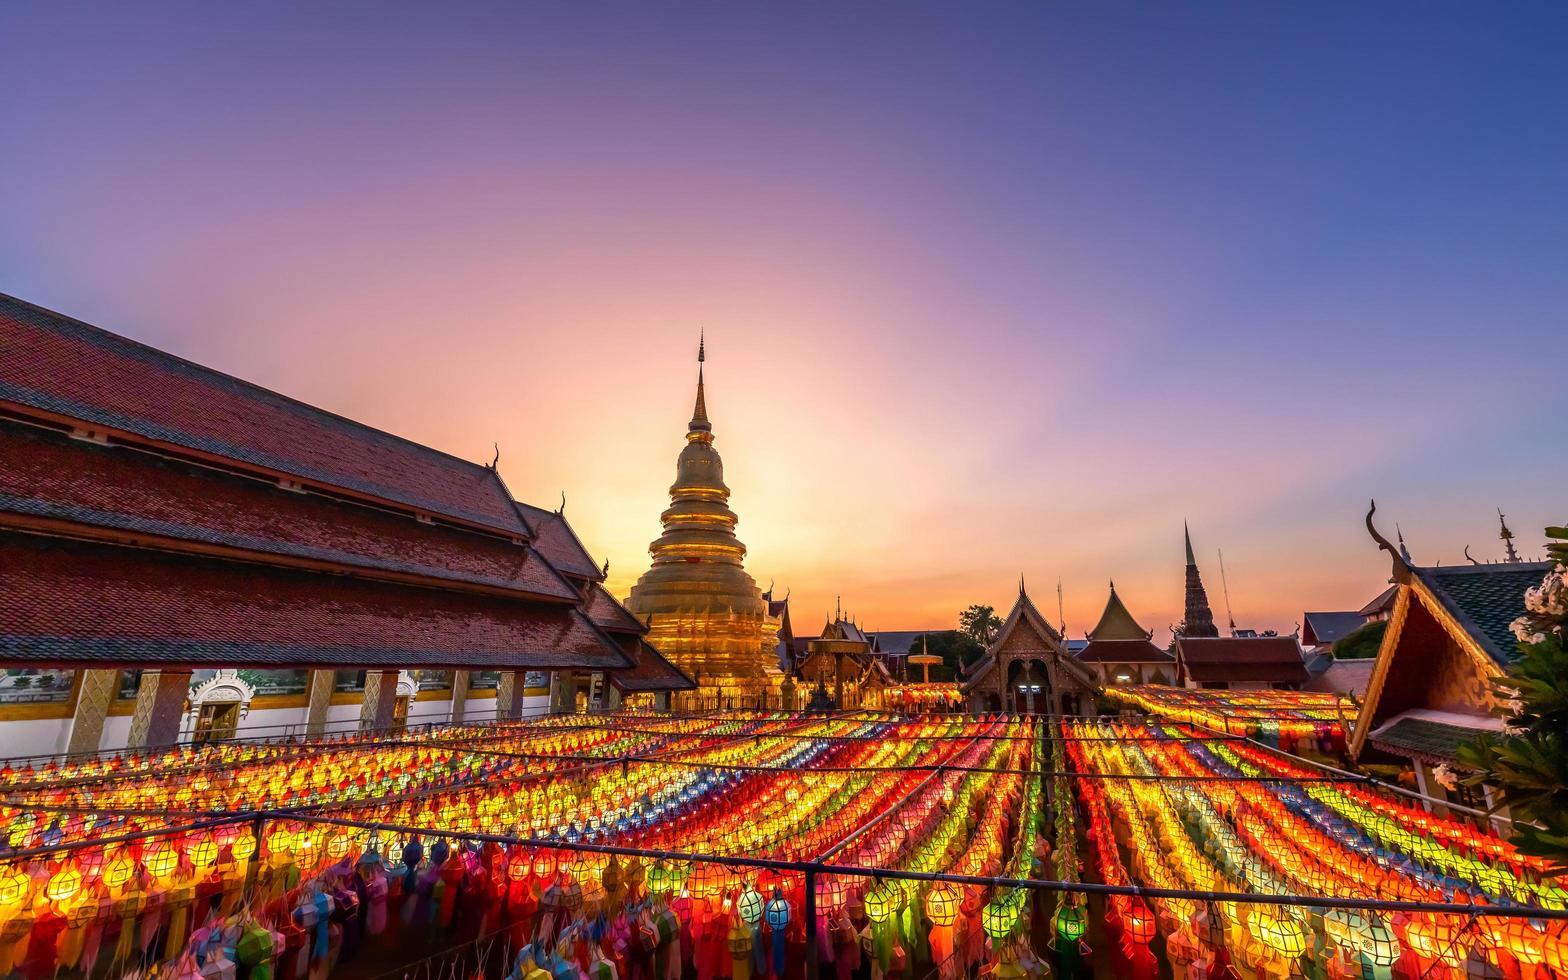 Sonnenuntergang über Yi Peng Festival in Thailand foto